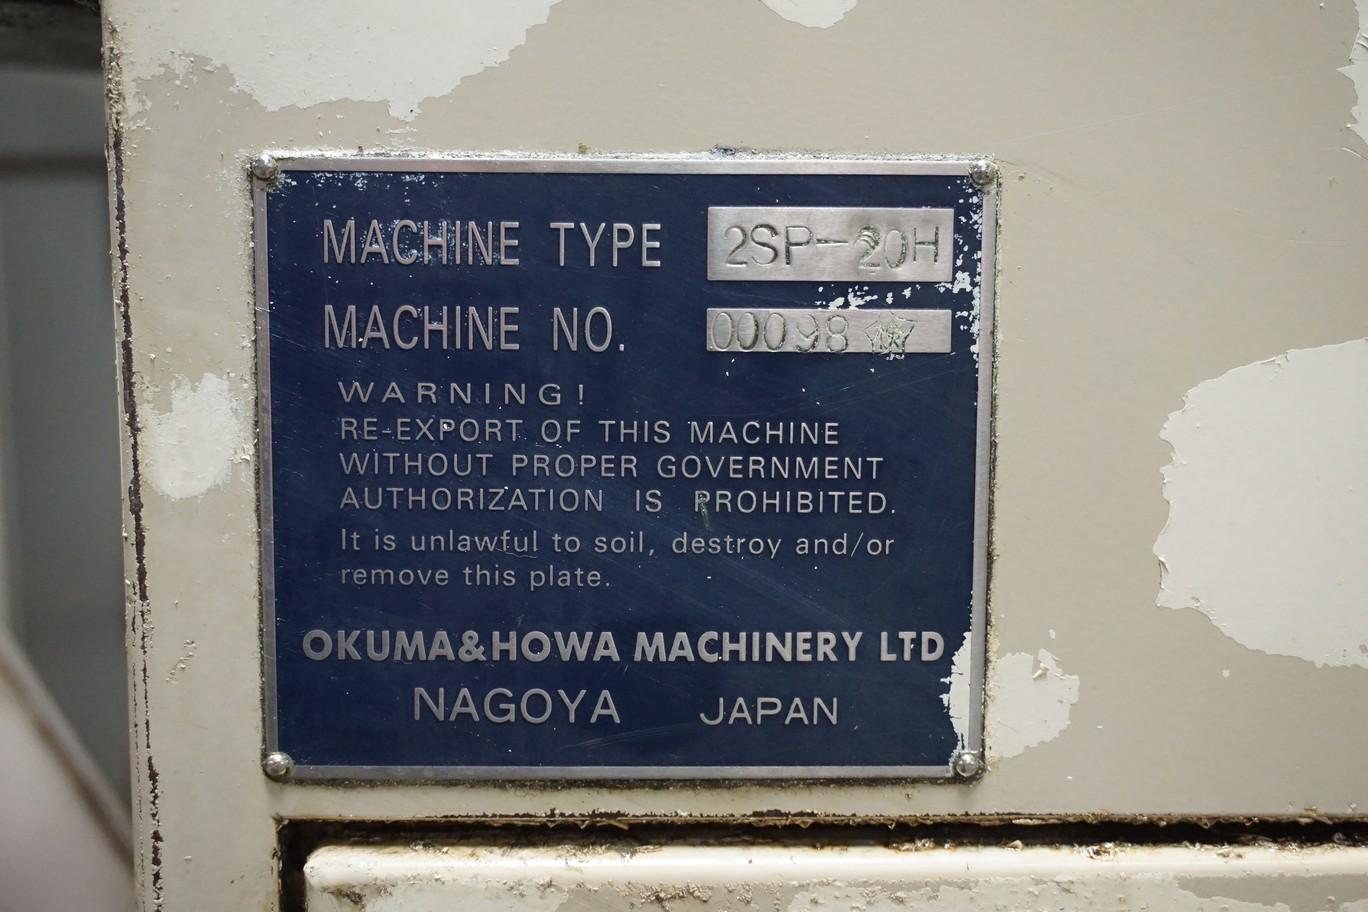 Okuma-Howa Model 2SP-20H CNC Lathe, c/w Fanuc Series 18-TT Controller, Chip Conveyor, Transformer - Image 4 of 7